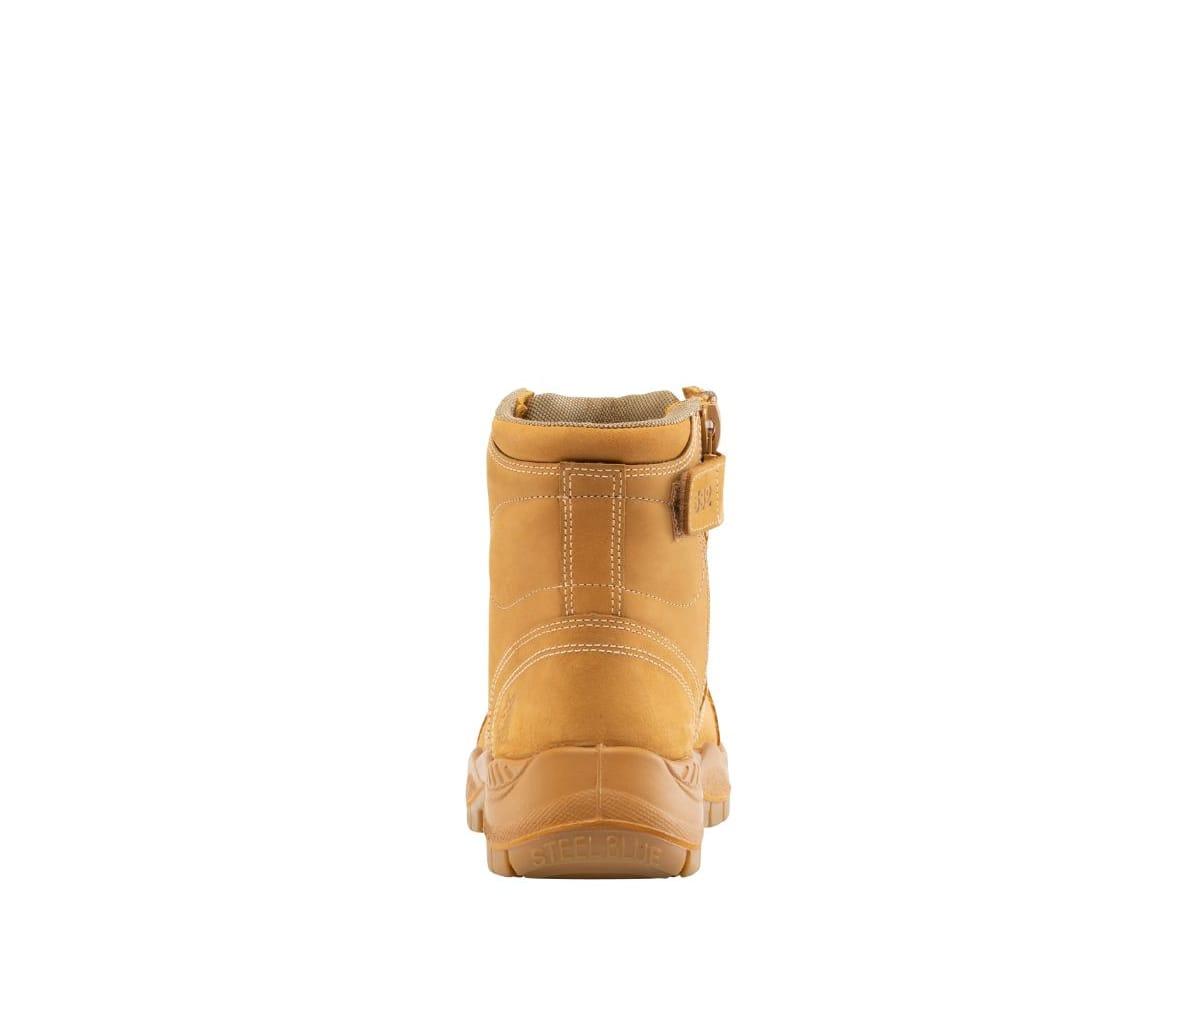 Argyle® Zip: Composite - Wheat